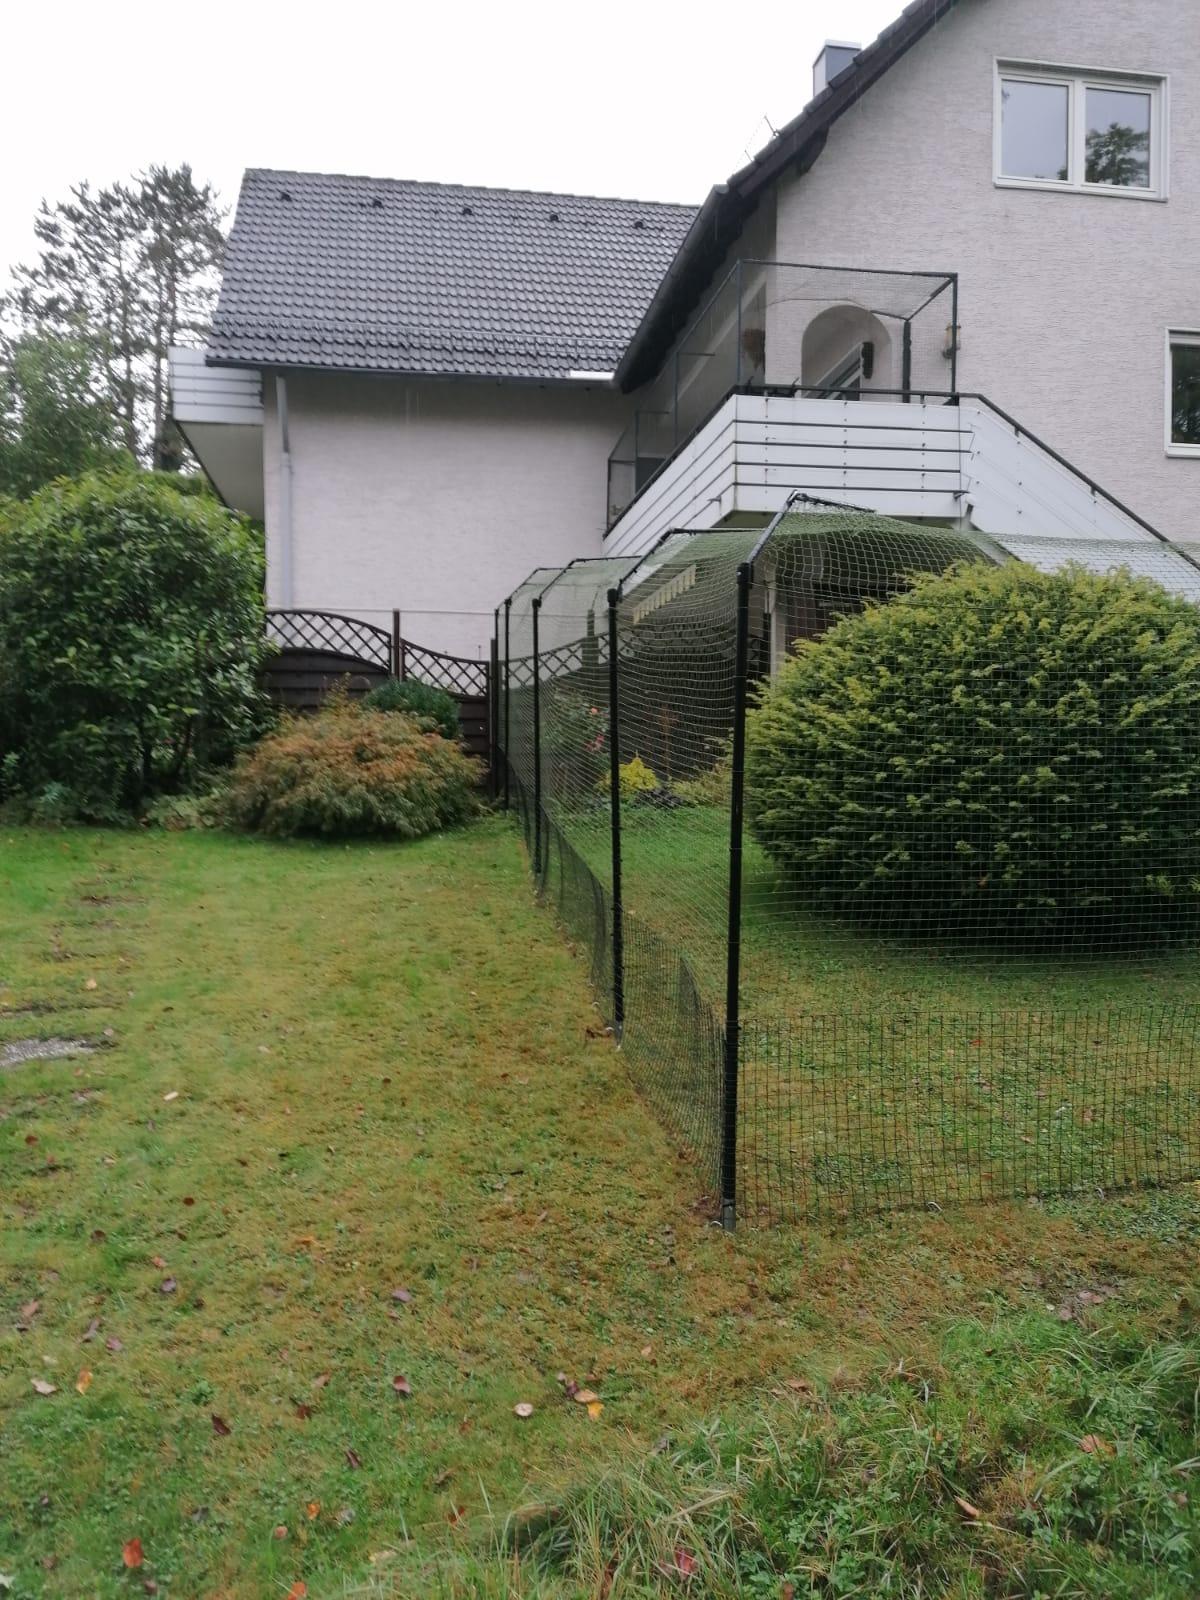 Katzennetz-System_Katzennetz_Garten_Katzennetze-NRW